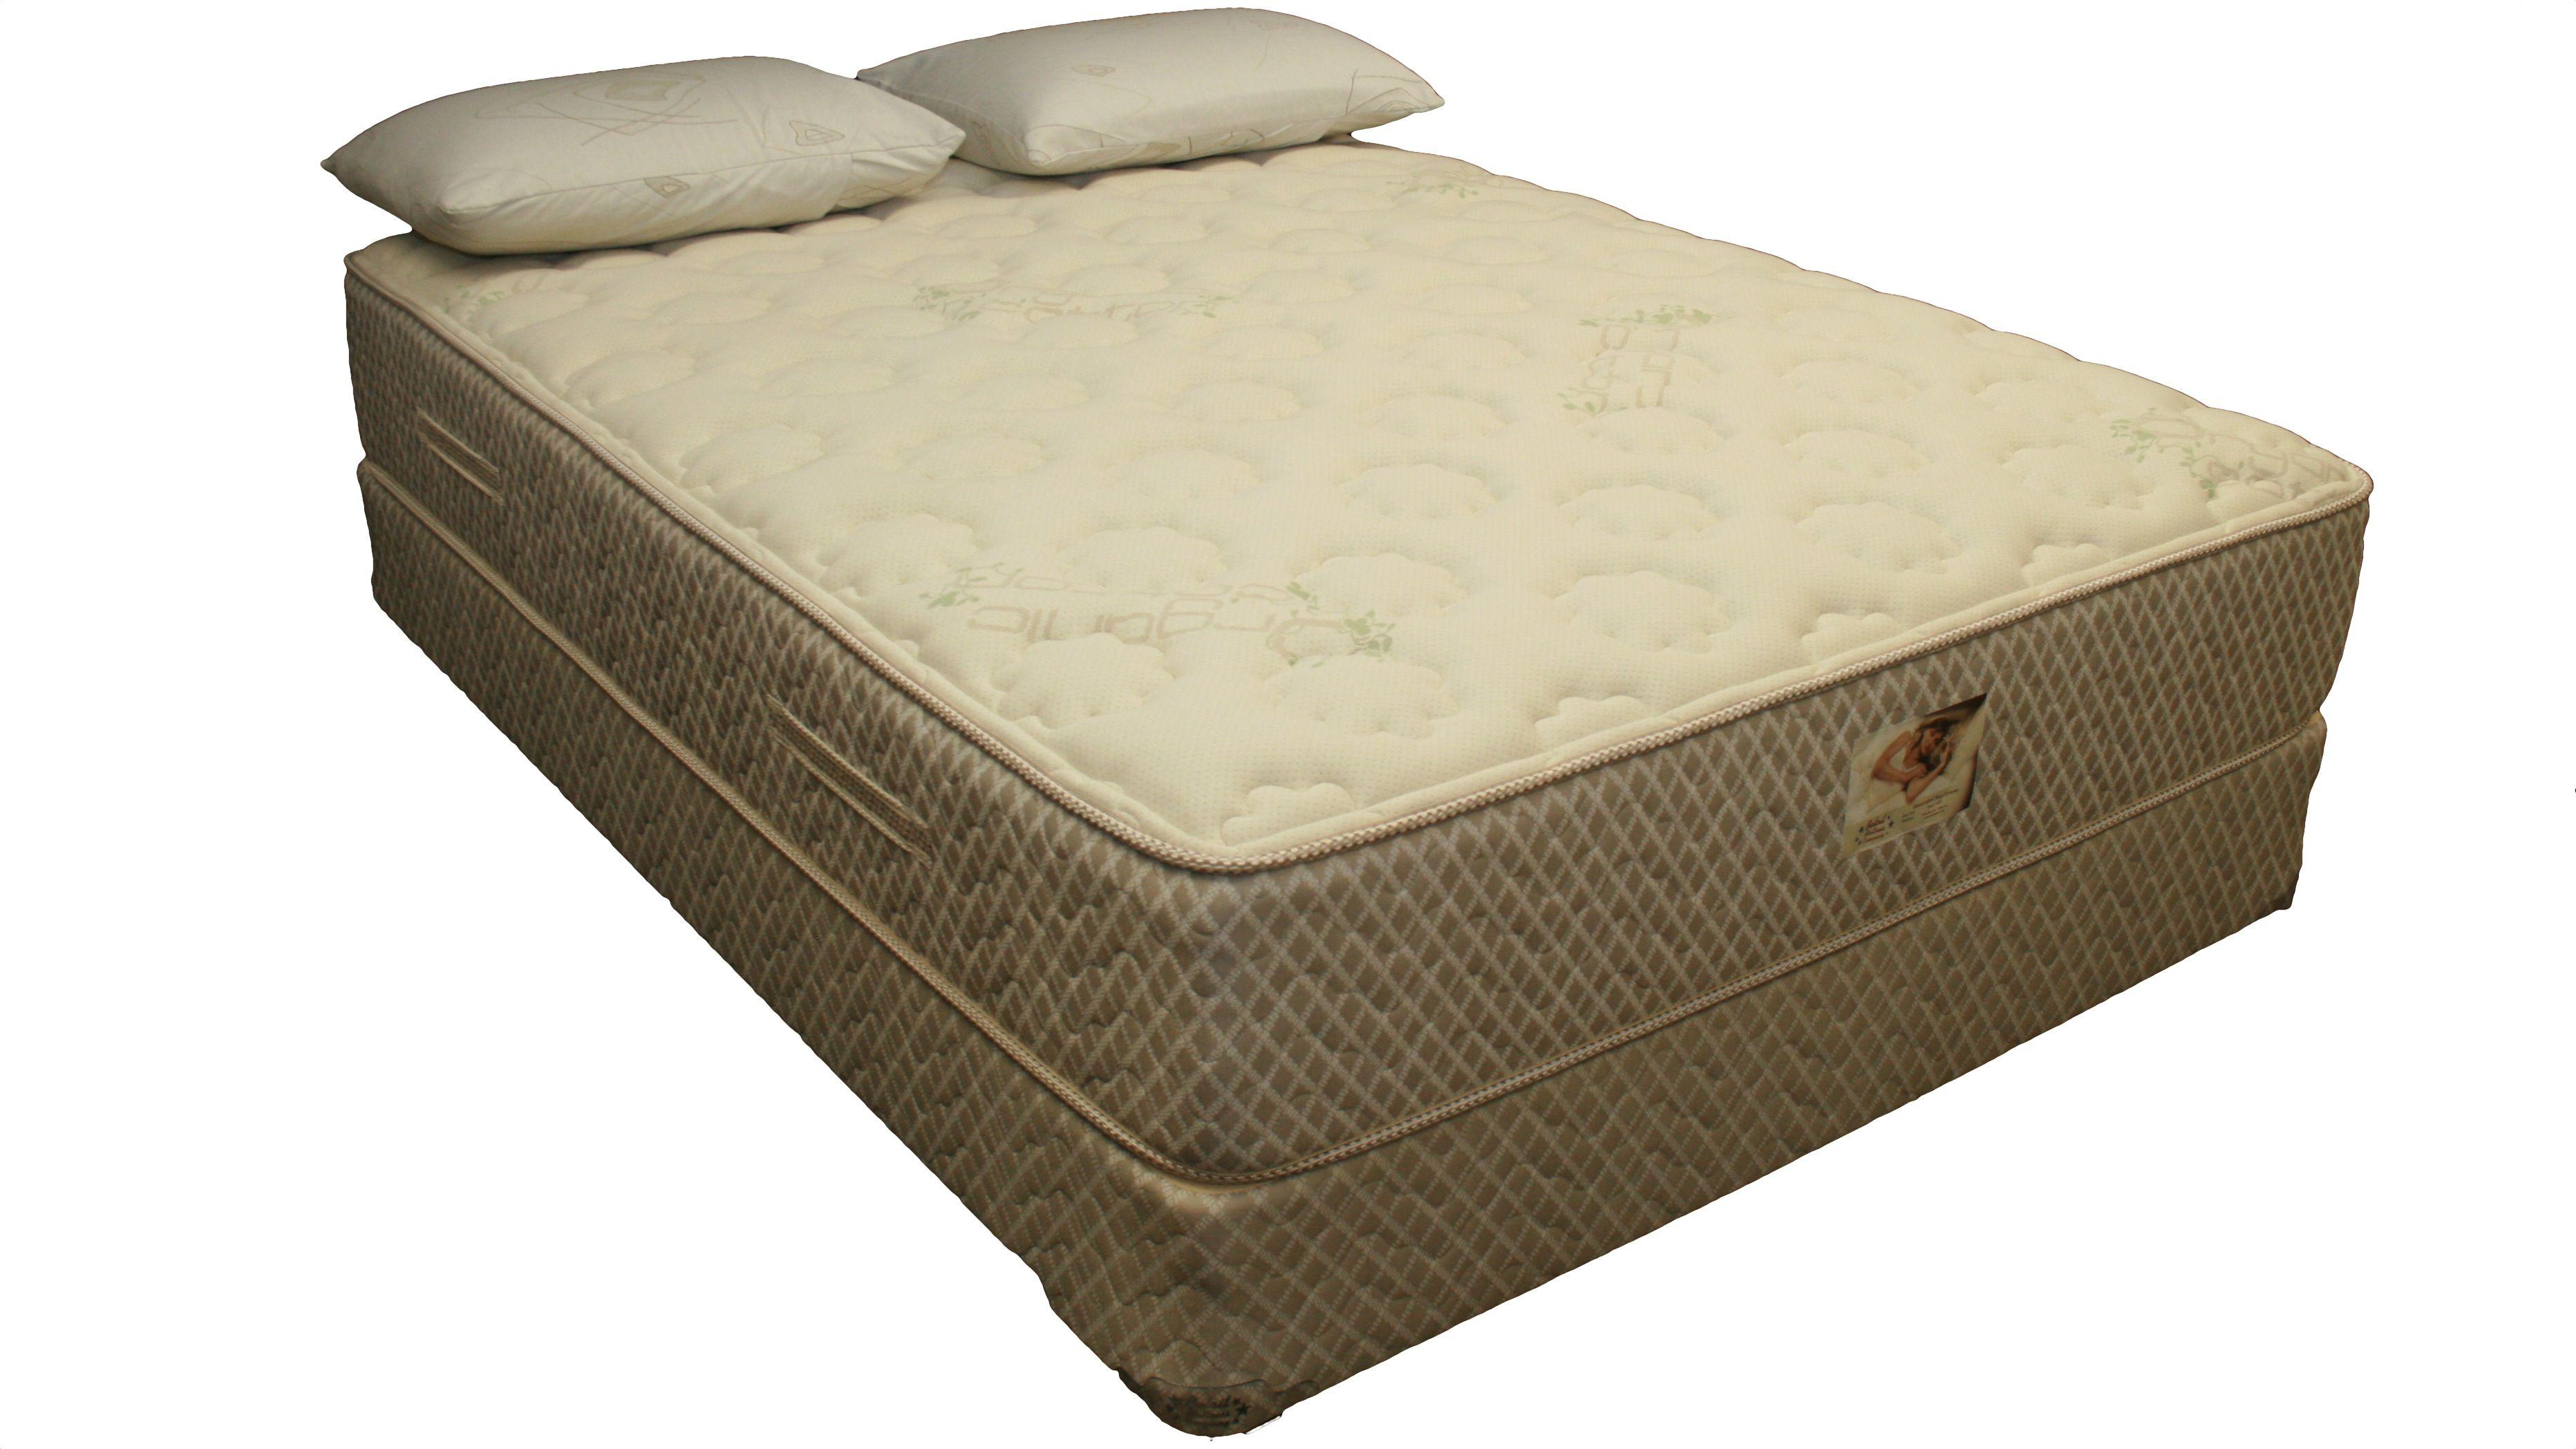 undef image type sa whitesh ex picid bed src orthopedic cm foam comfortable memory mattress